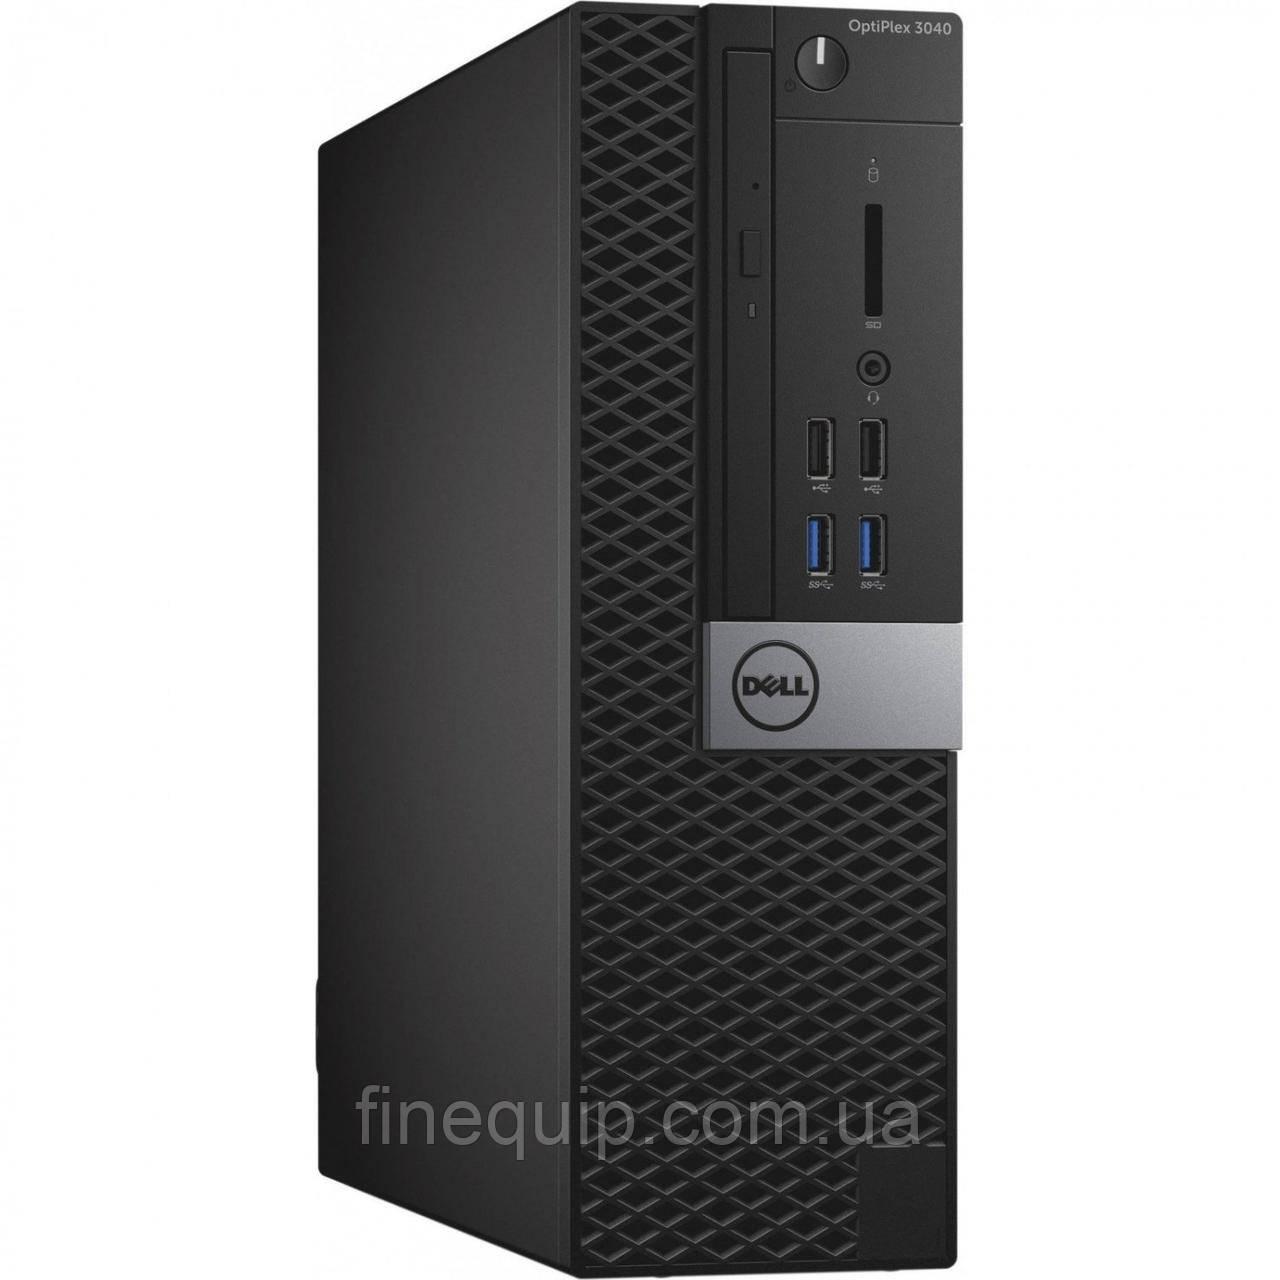 Системний блок Dell Optiplex 5050 SFF-Intel Core-i3-7100-3.9GHz-4Gb-DDR4-HDD-500Gb- Б/В